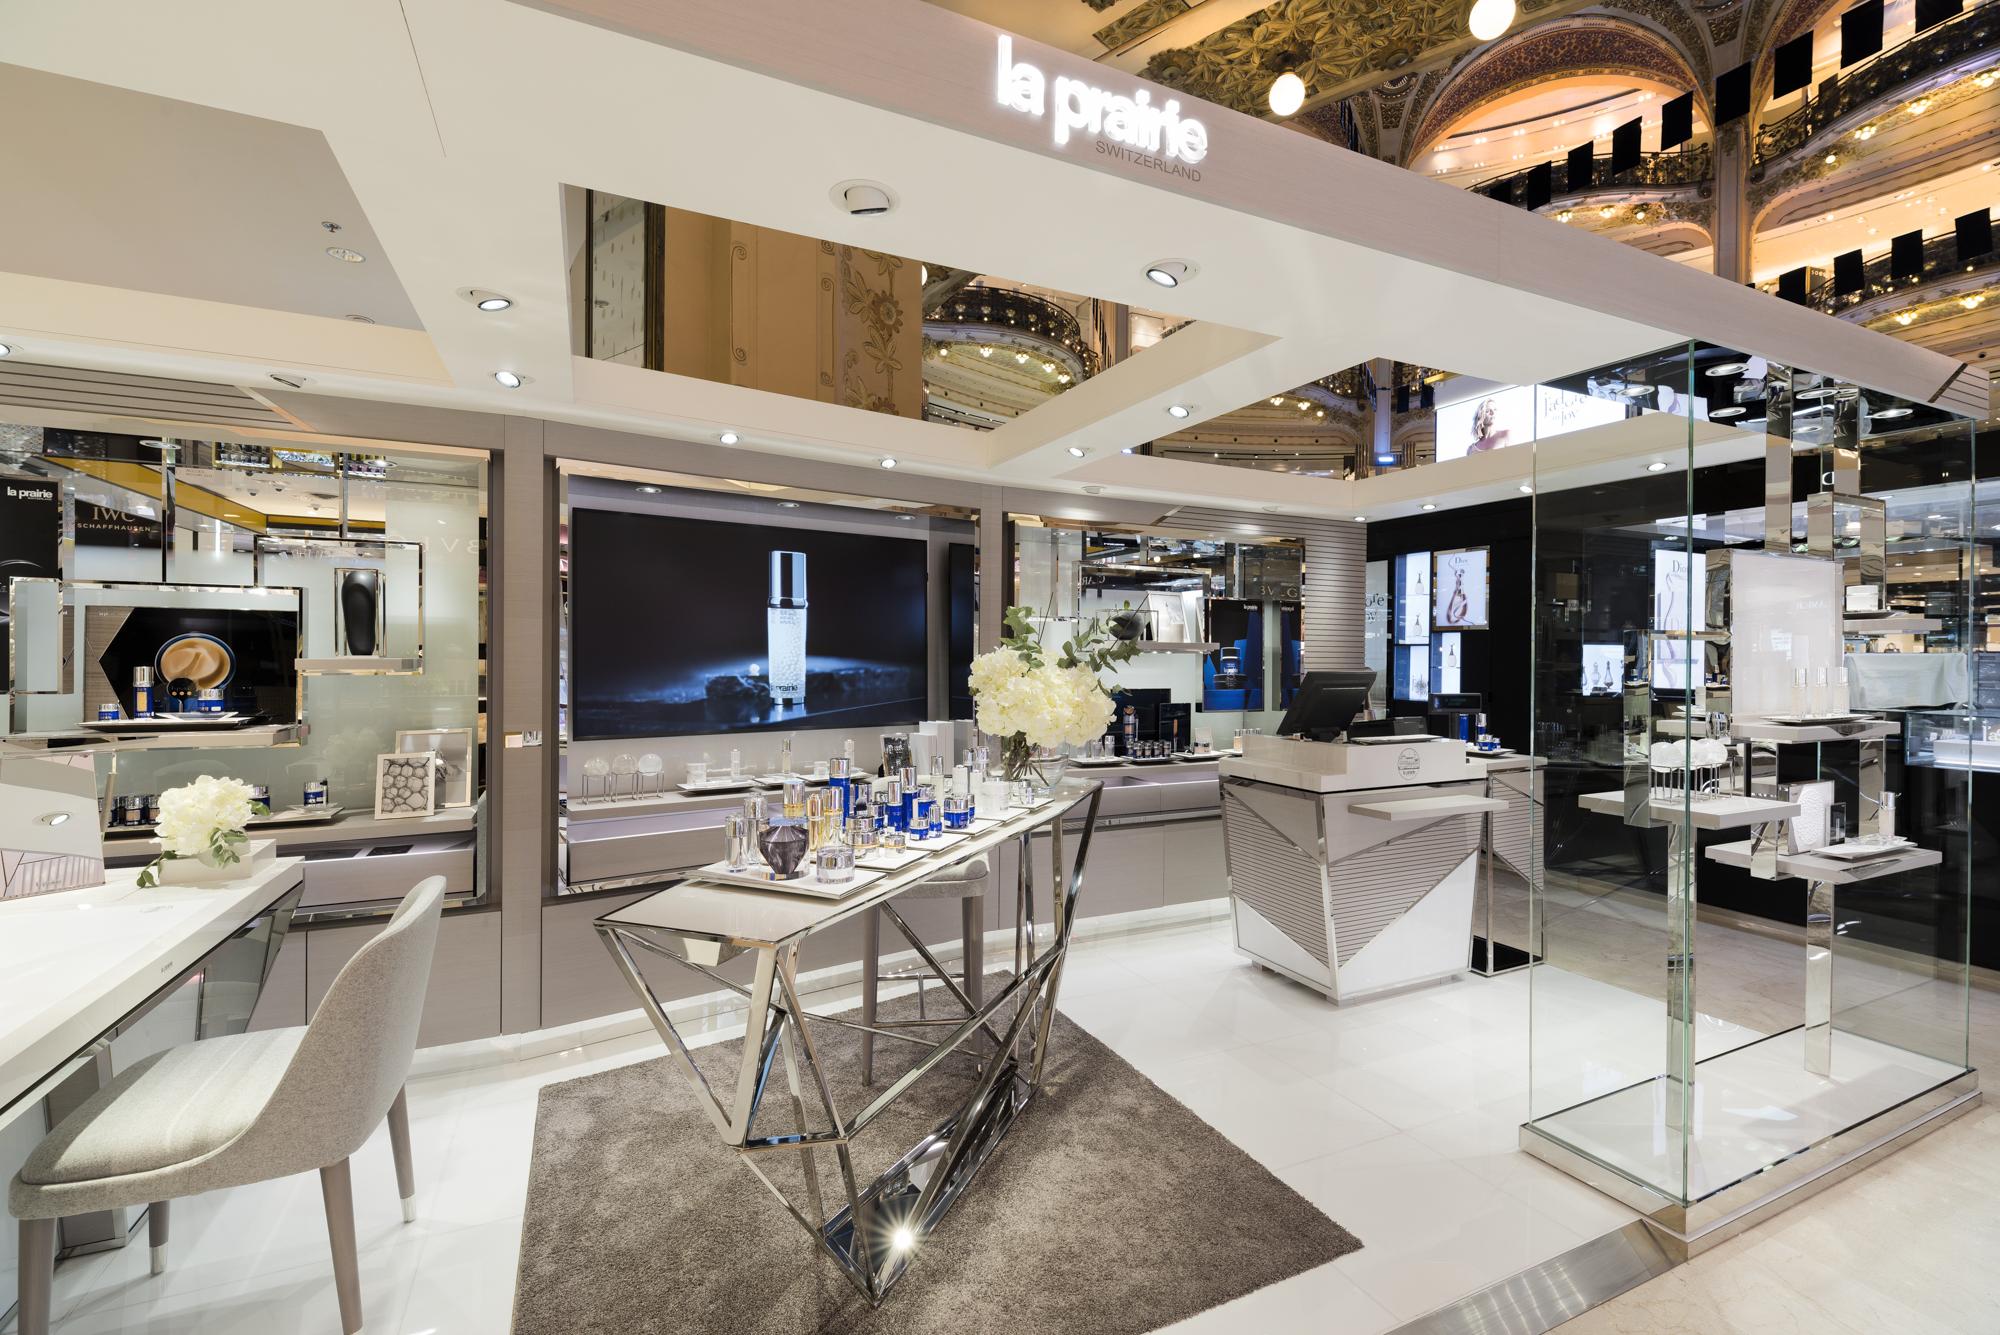 La Prairie's new store design at Galeries Lafayette.